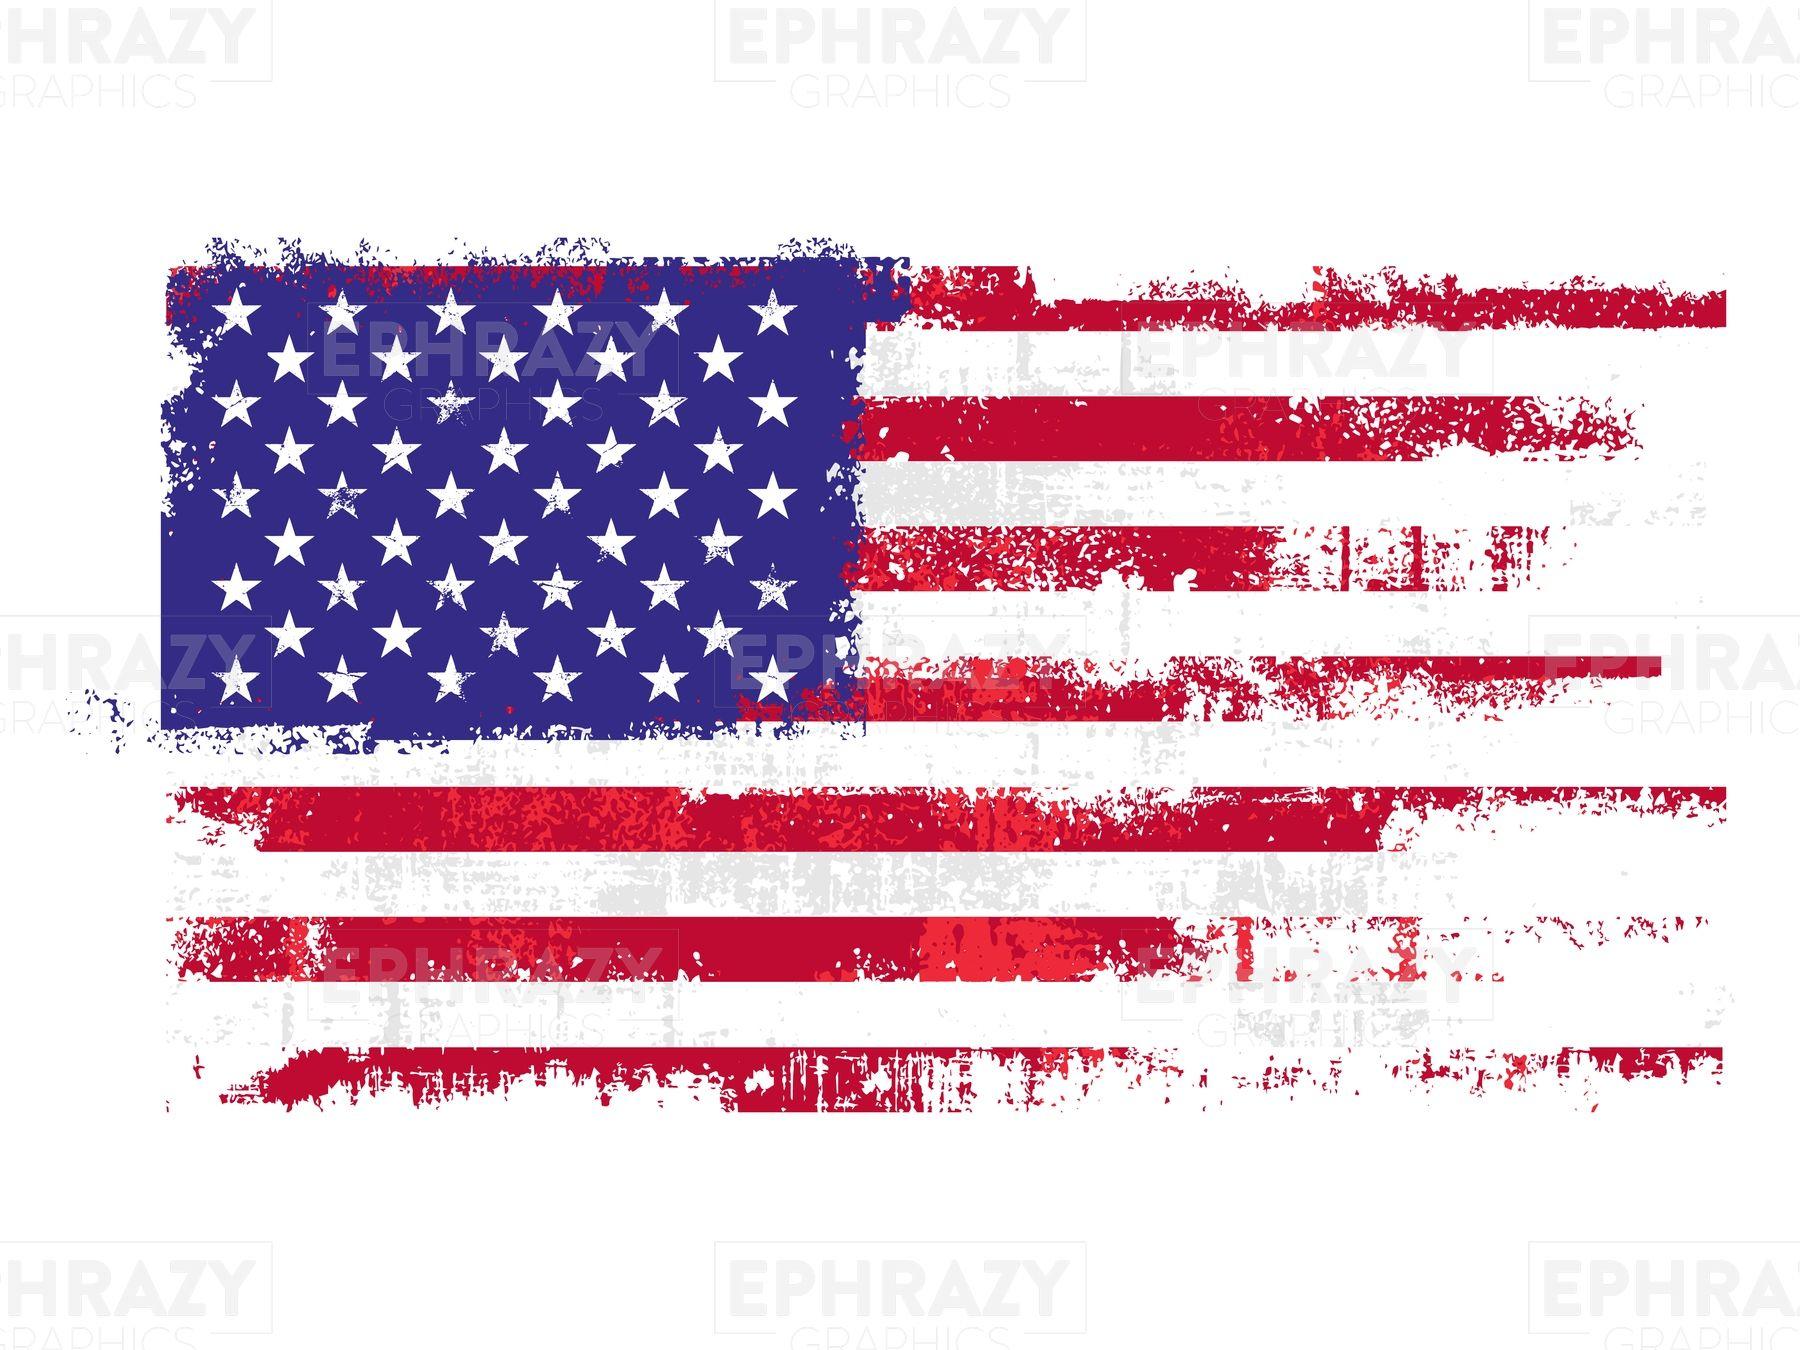 Usa Flag Clipart American Flag Svg 4th Of July Grunge Sublimation Patriotic Design Independence Day Vector Distressed Illustration In 2020 Usa Flag Flag Usa Patriotic